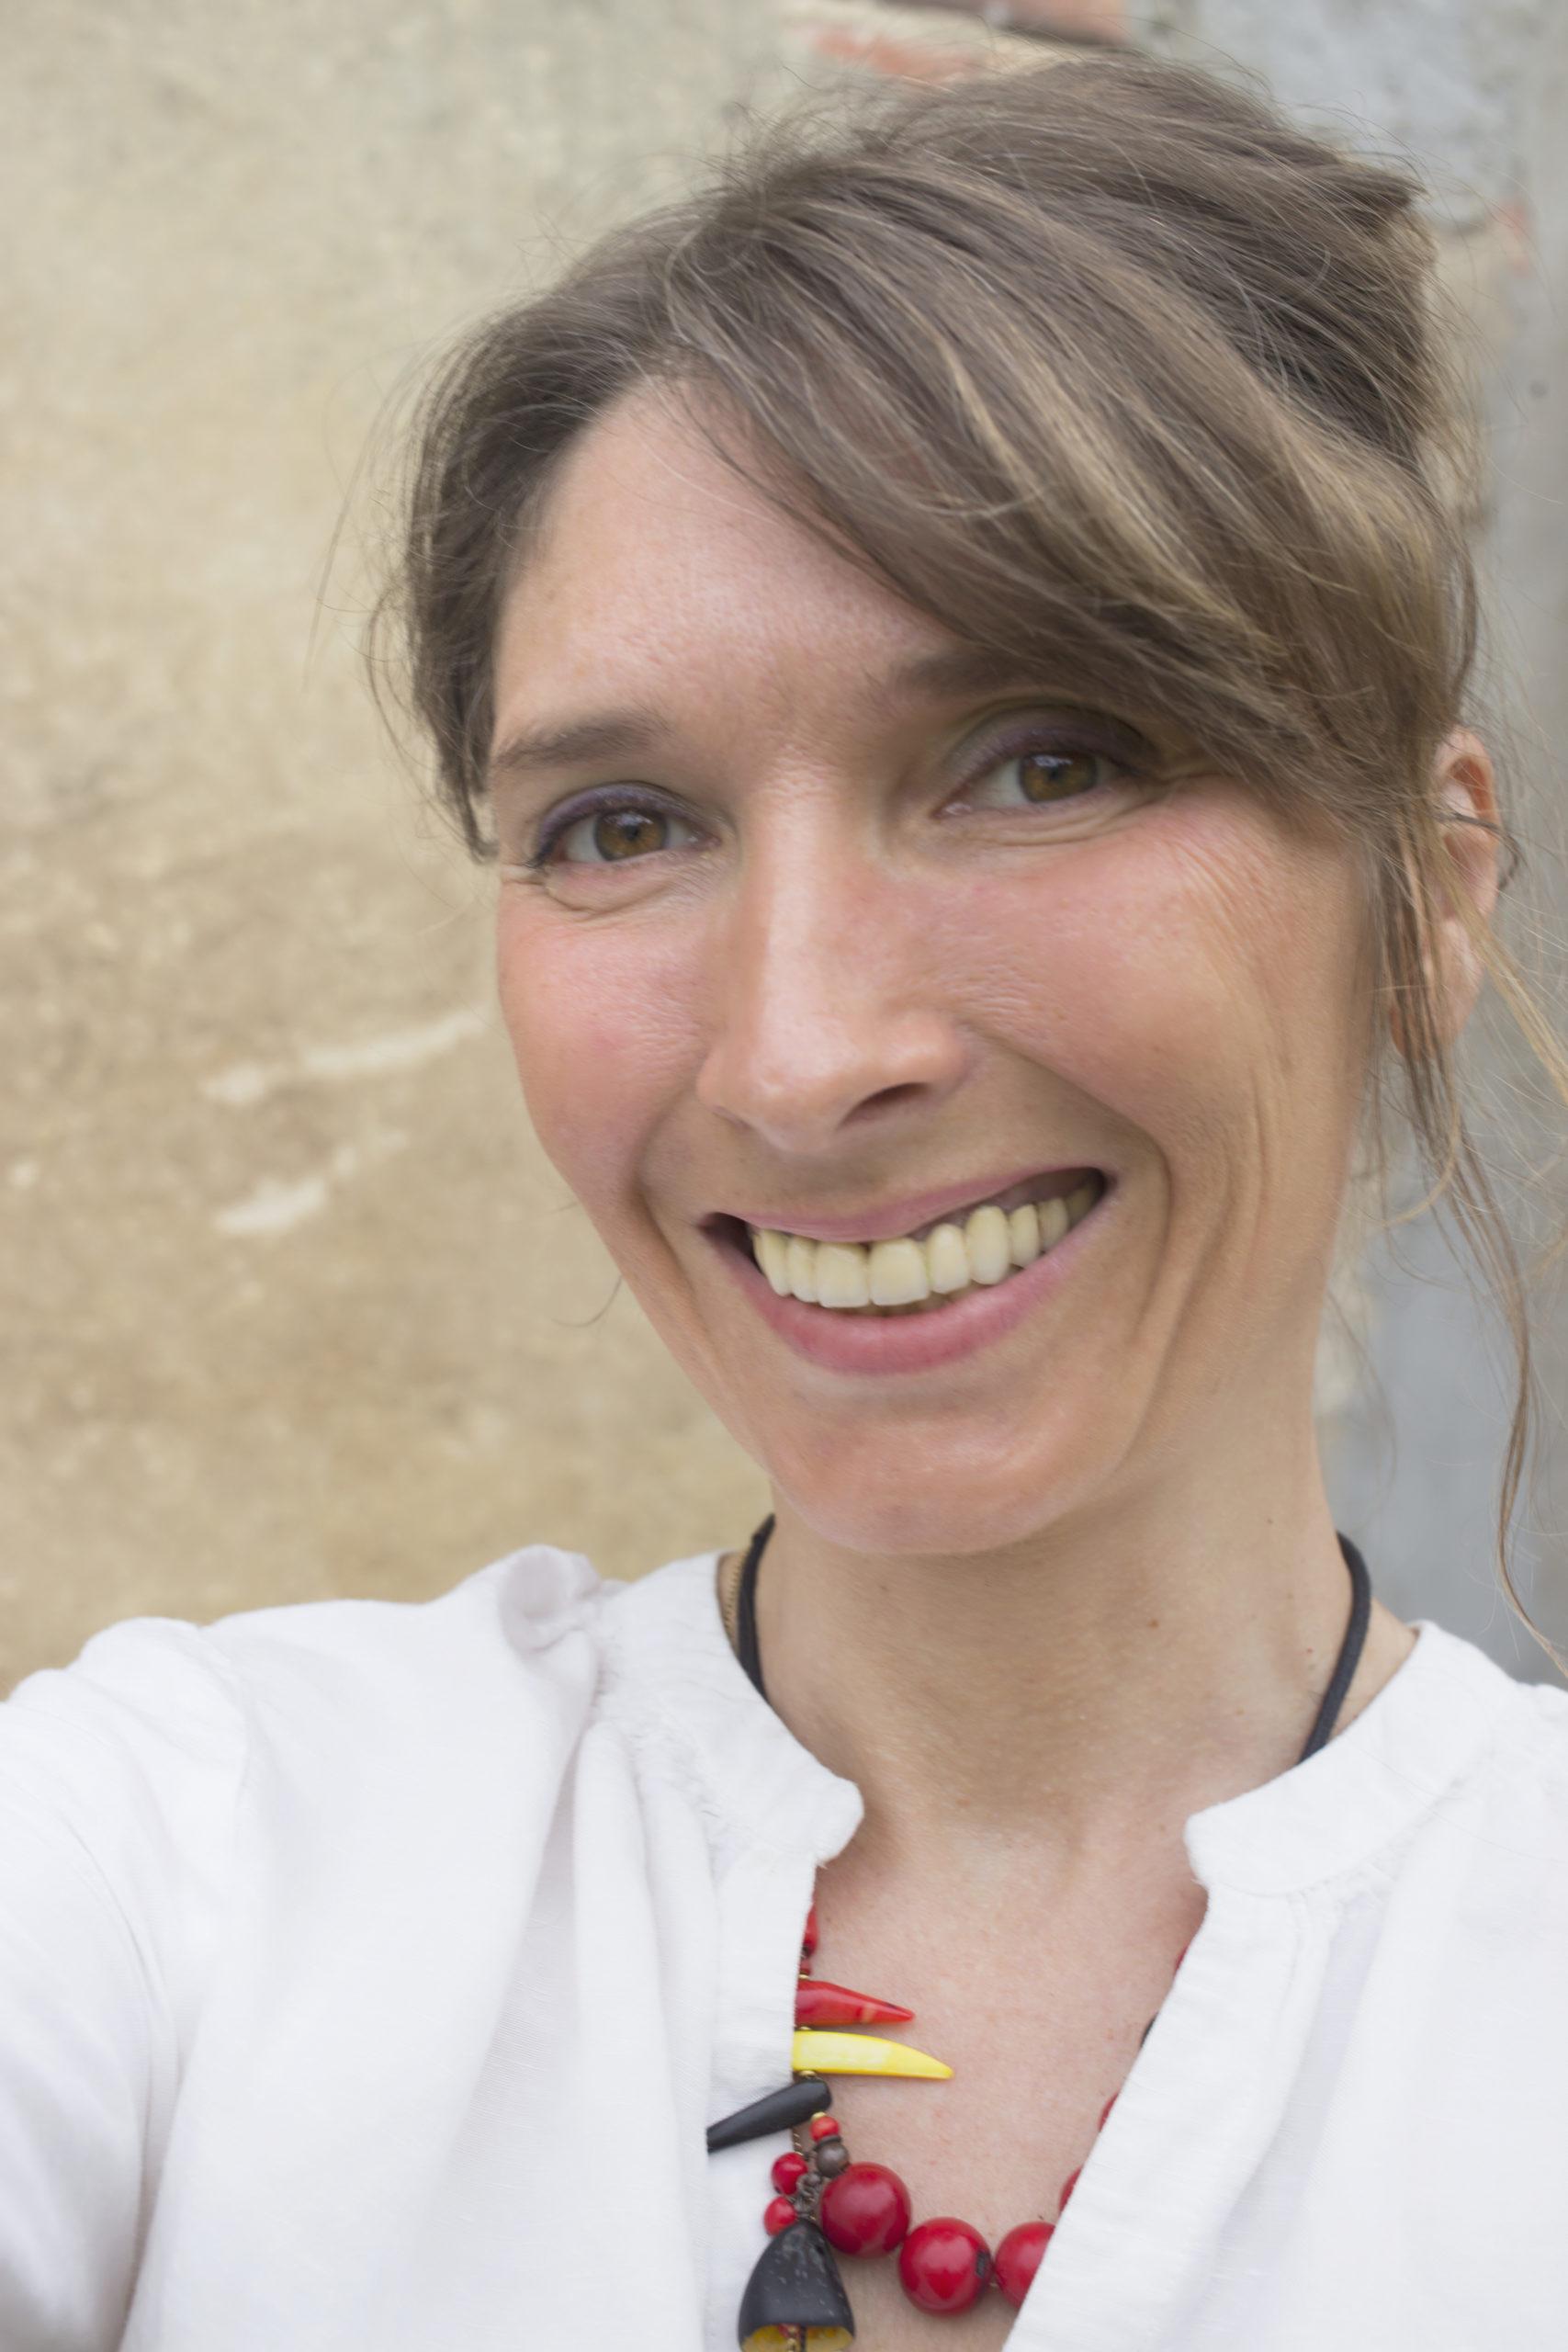 Sabrina Ambre Biller   Autrice, illustratrice et photographe